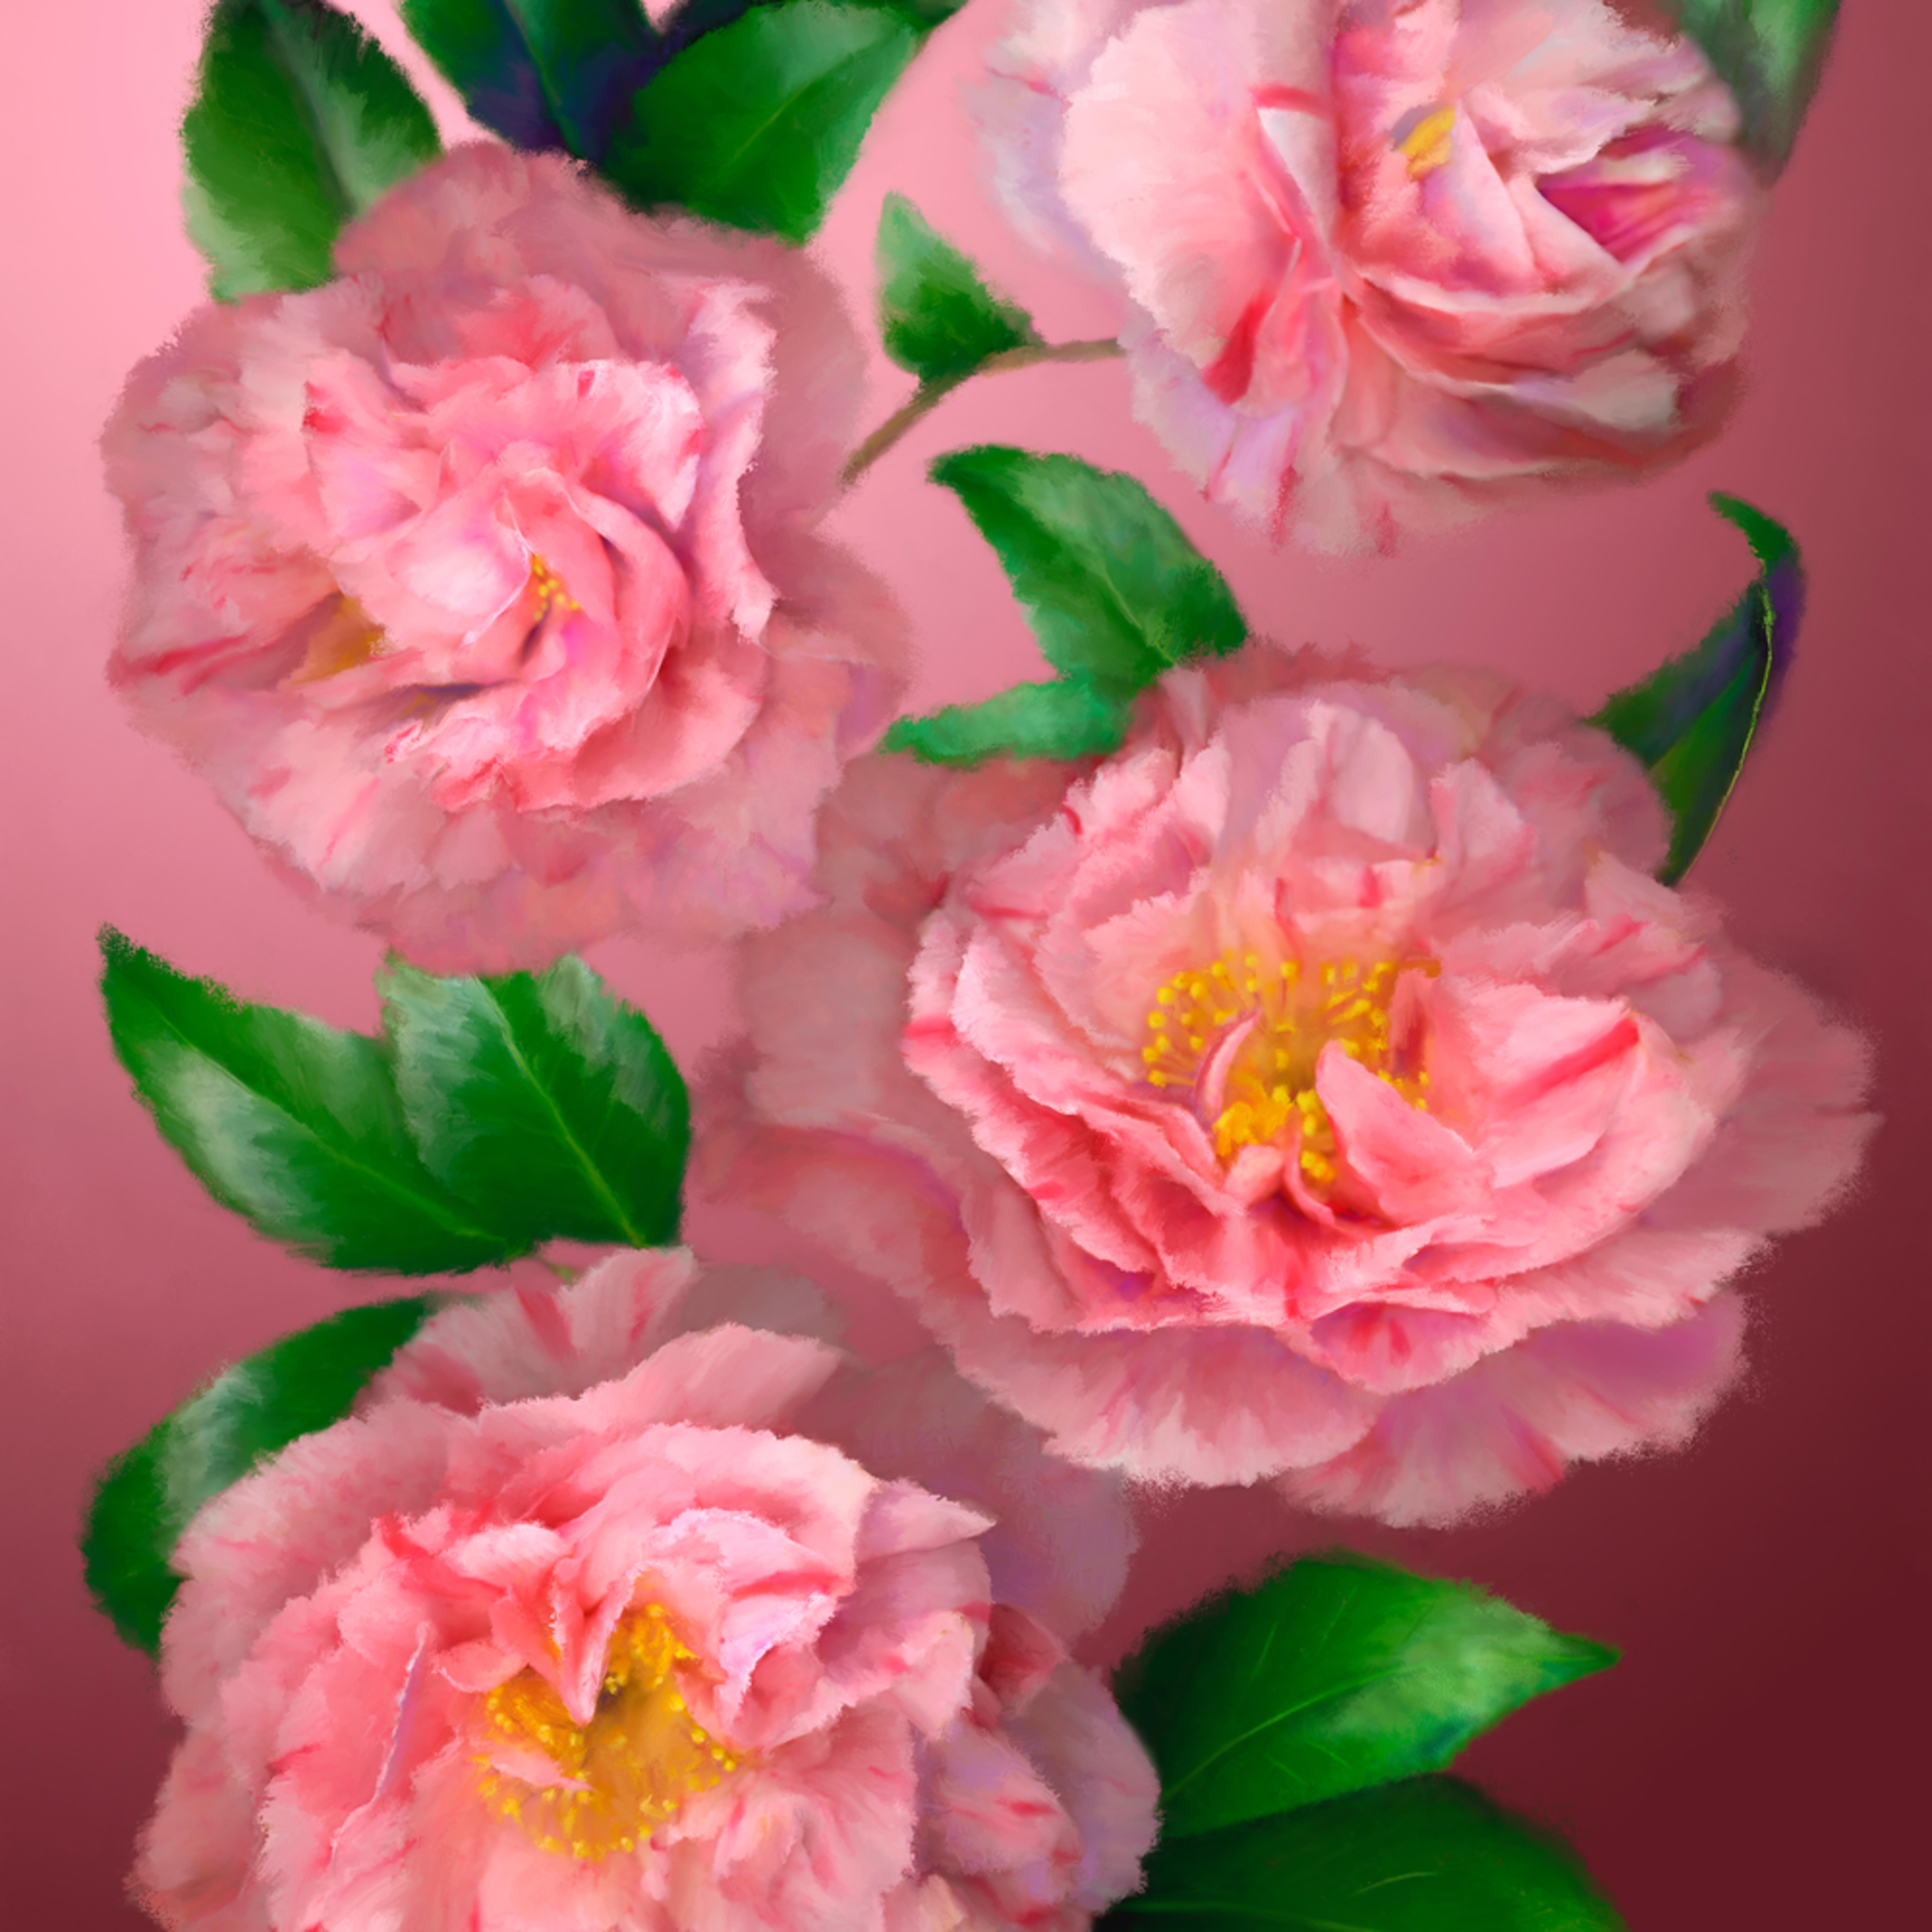 110602 ahern pink camellias 30x40x300 metal print hrdy7j